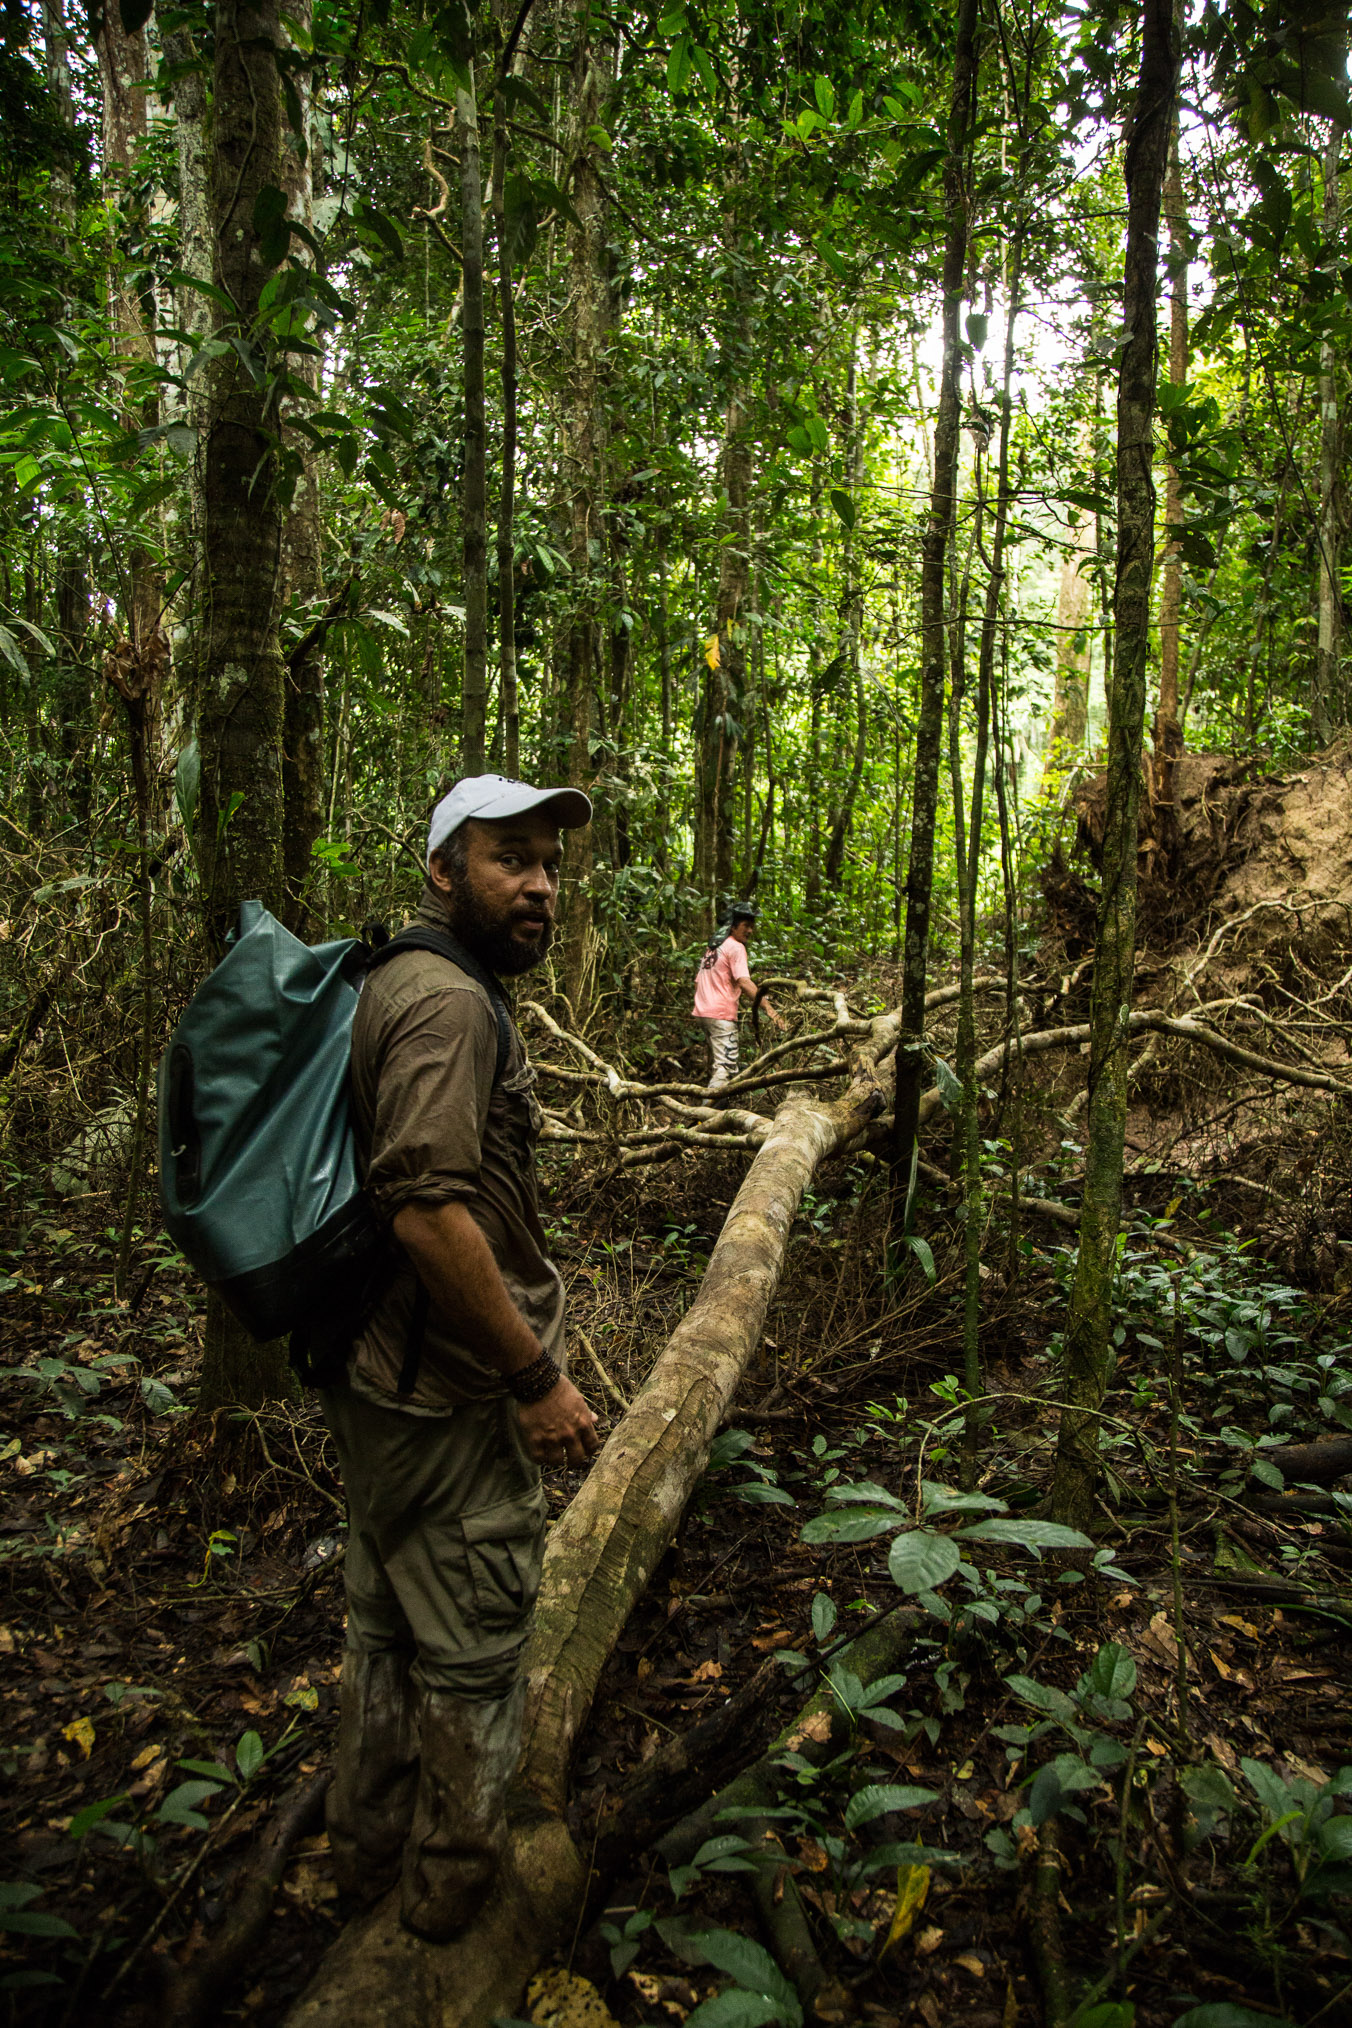 Brazilian primatologist Felipe Ennes follows a local guide down an overgrown trail to search for saki monkeys in the Amazon rainforest.